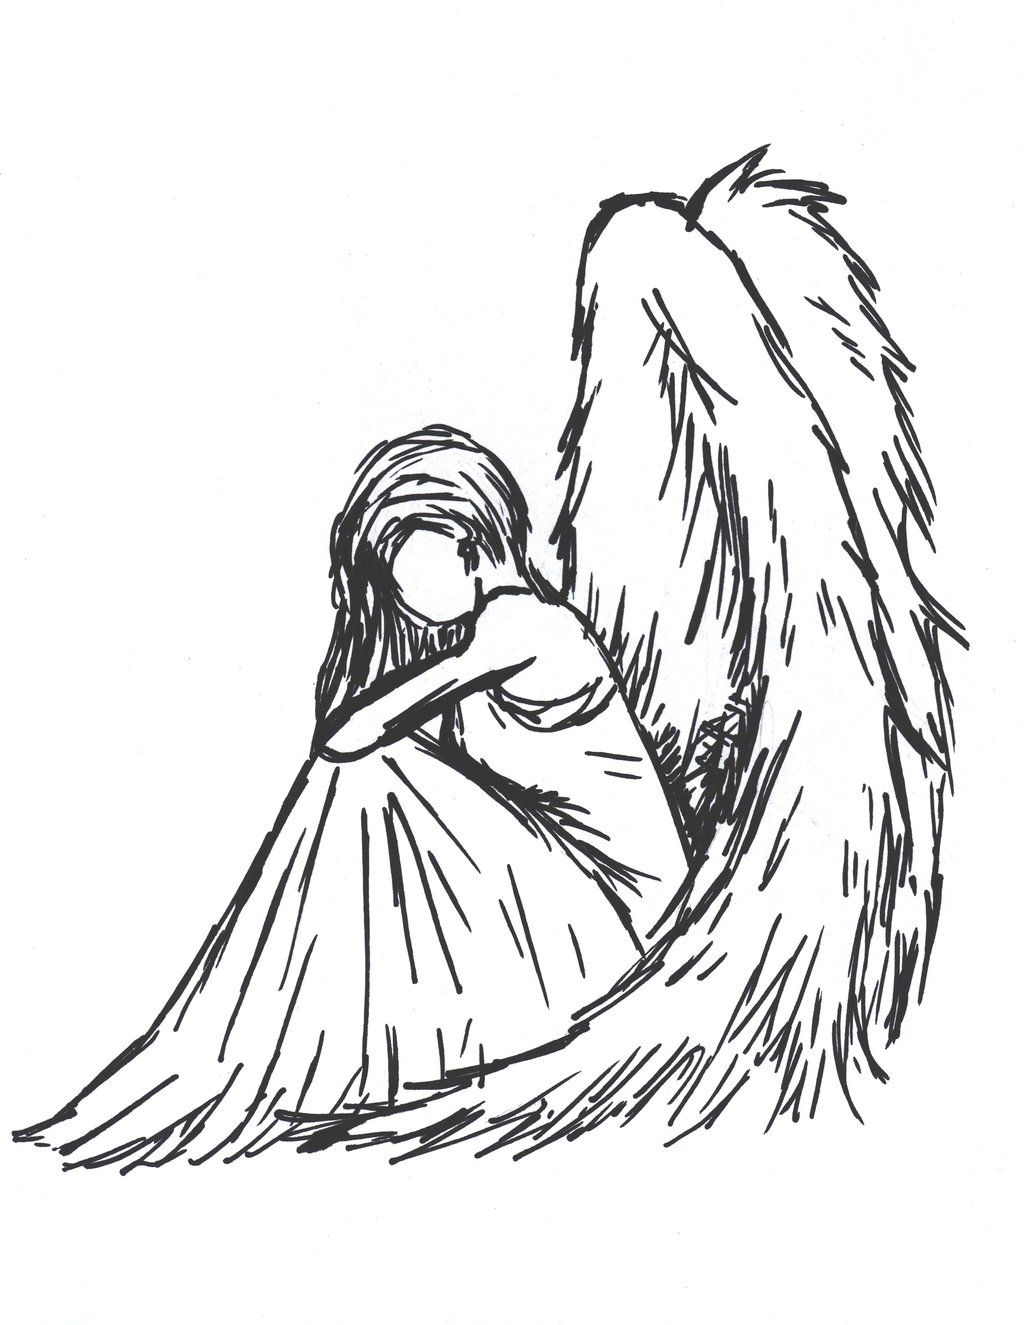 Sioban Mckey Sad Angel By Sioban Mckey On Deviantart And Tumblr